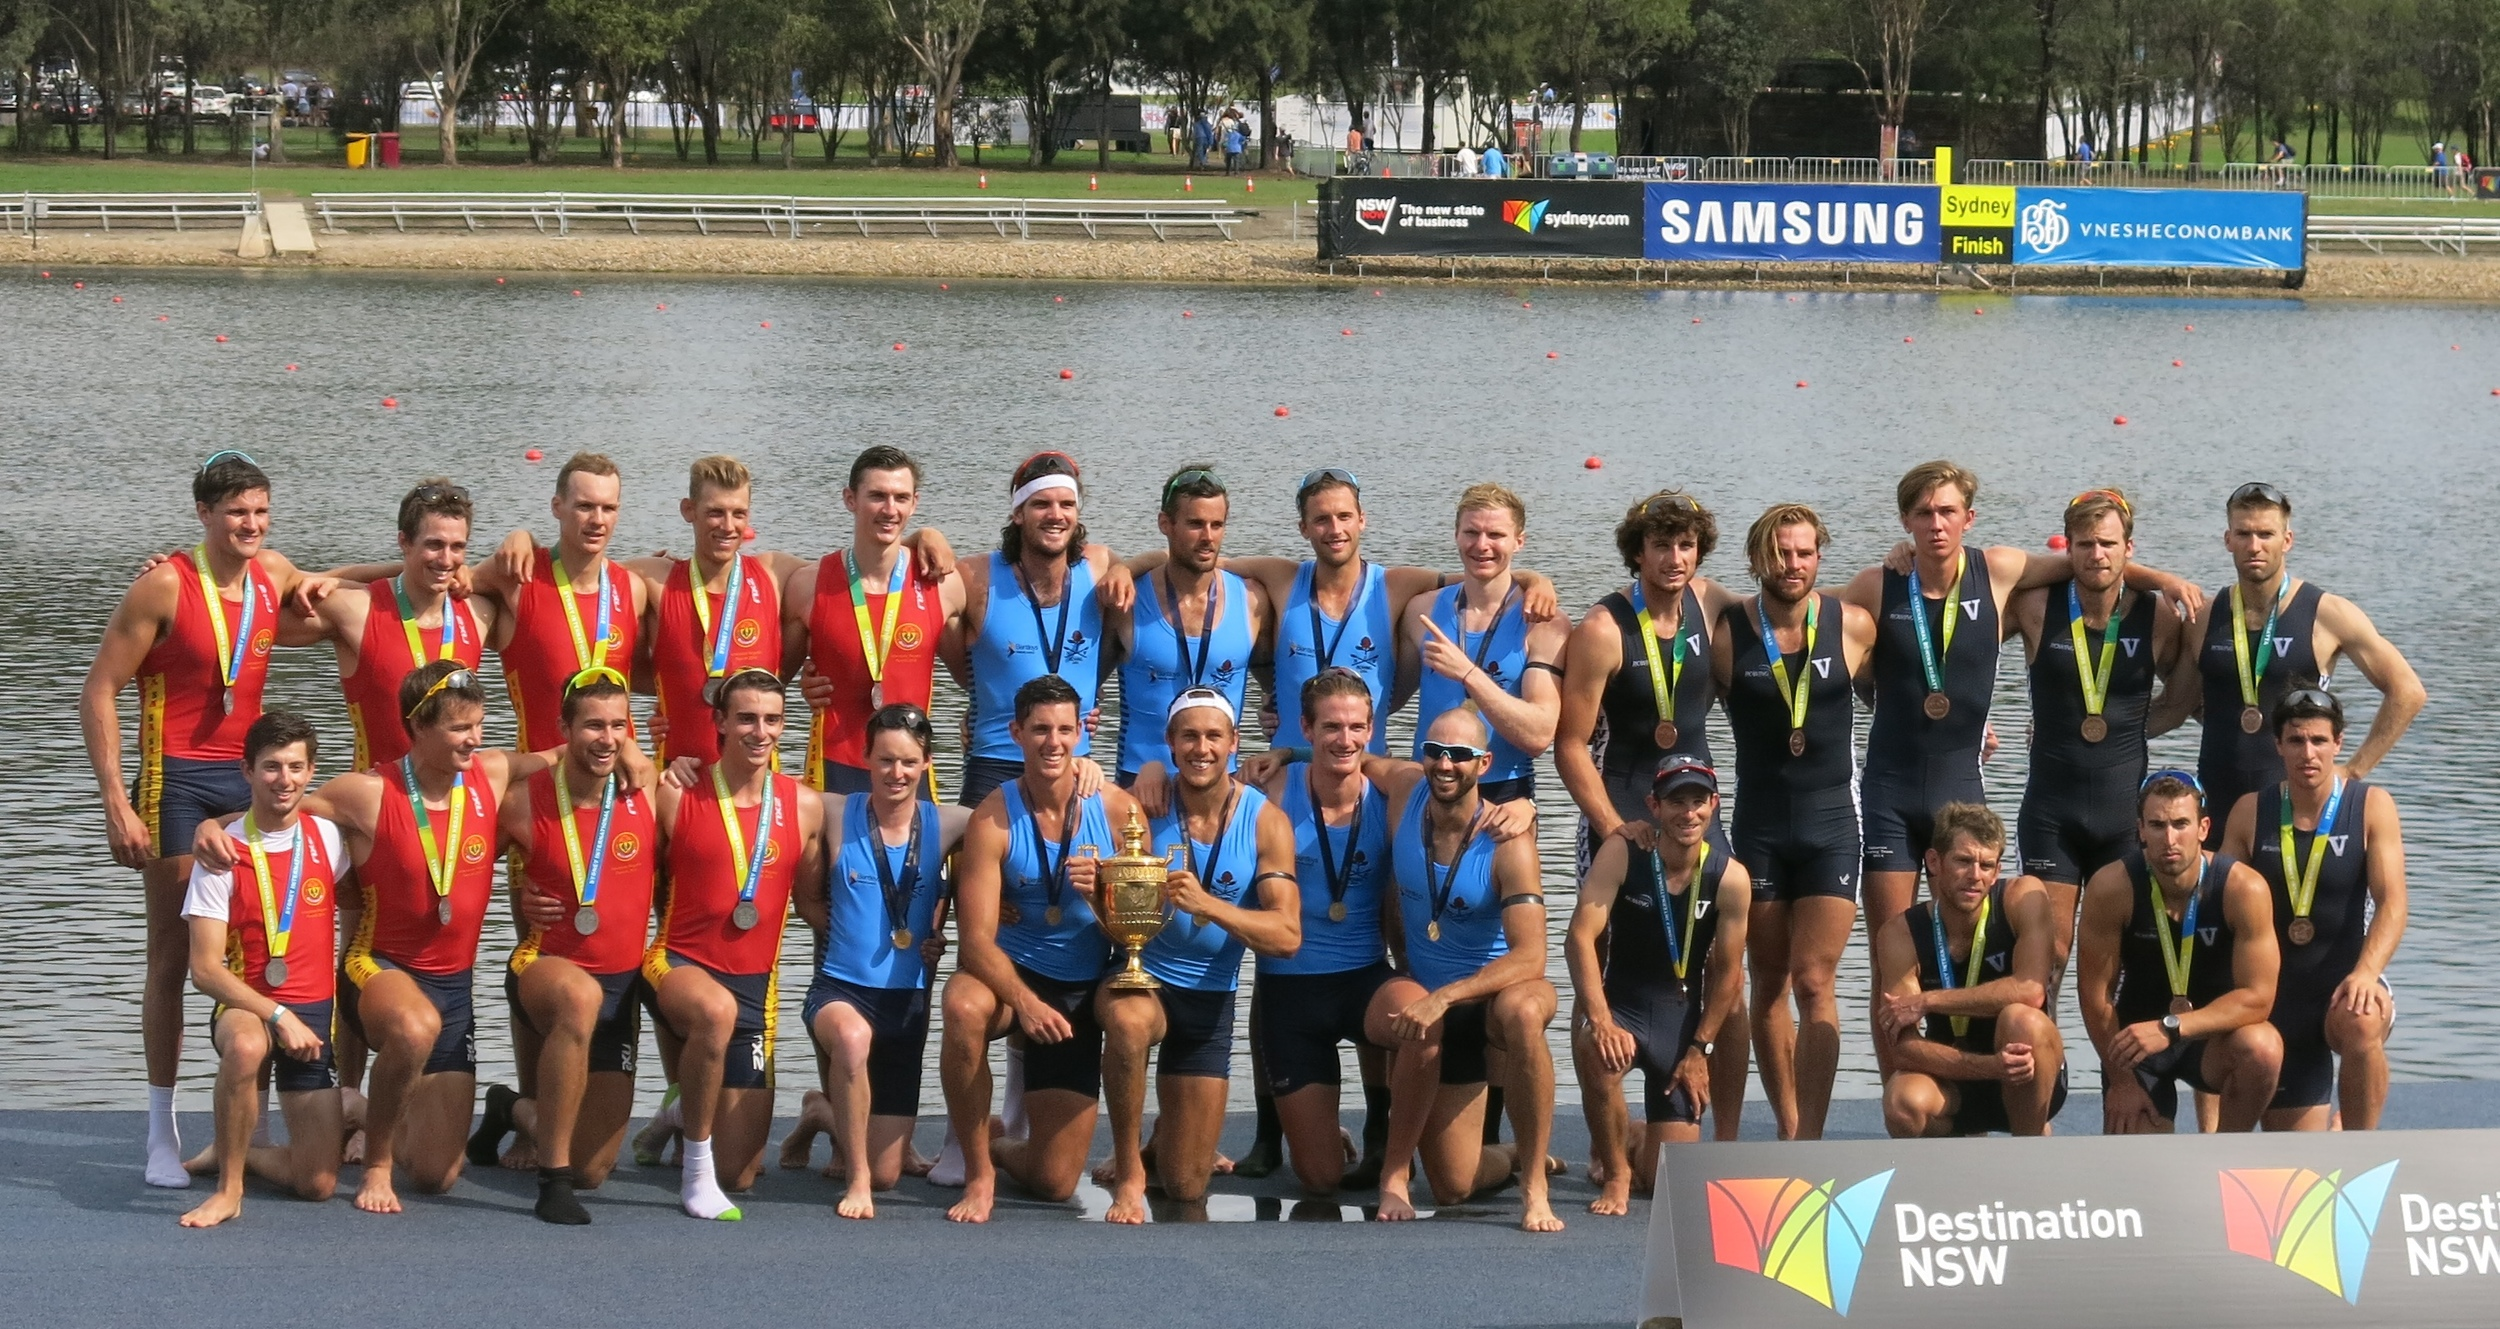 NSW, SA and Victoria on podium 2014 King's Cup